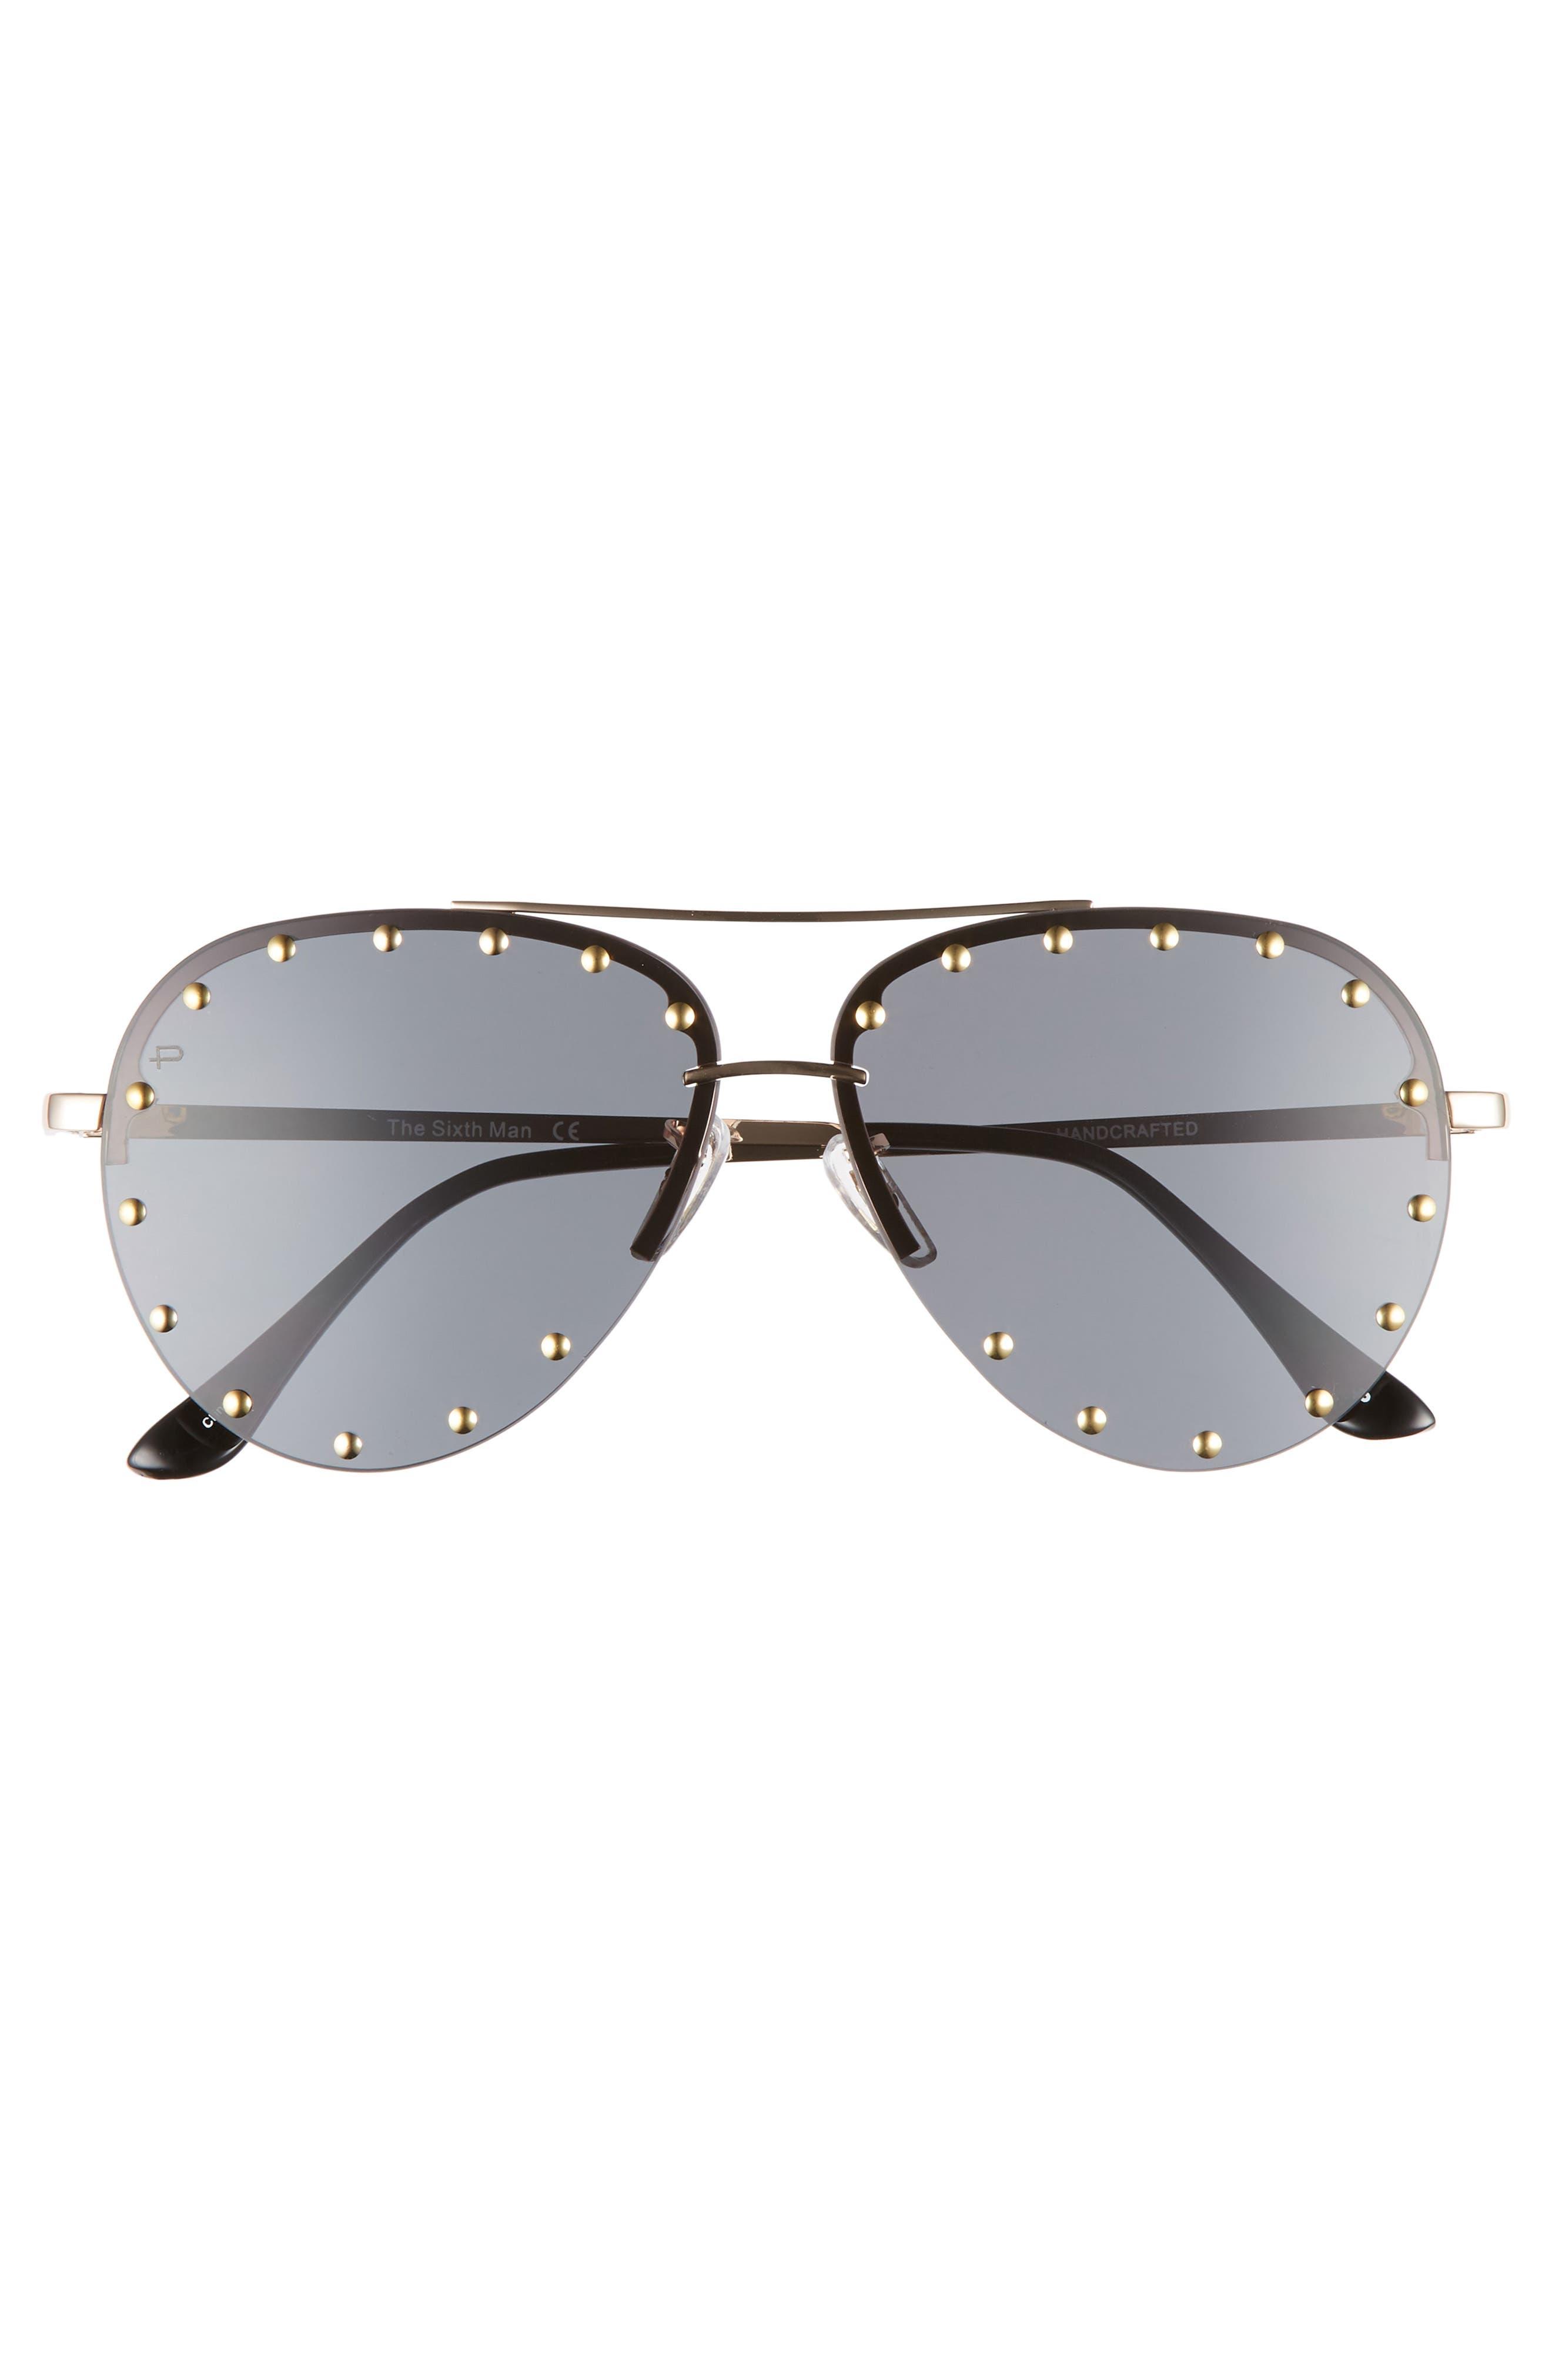 Privé Revaux The Sixth Man 60mm Studded Aviator Sunglasses,                             Alternate thumbnail 3, color,                             001